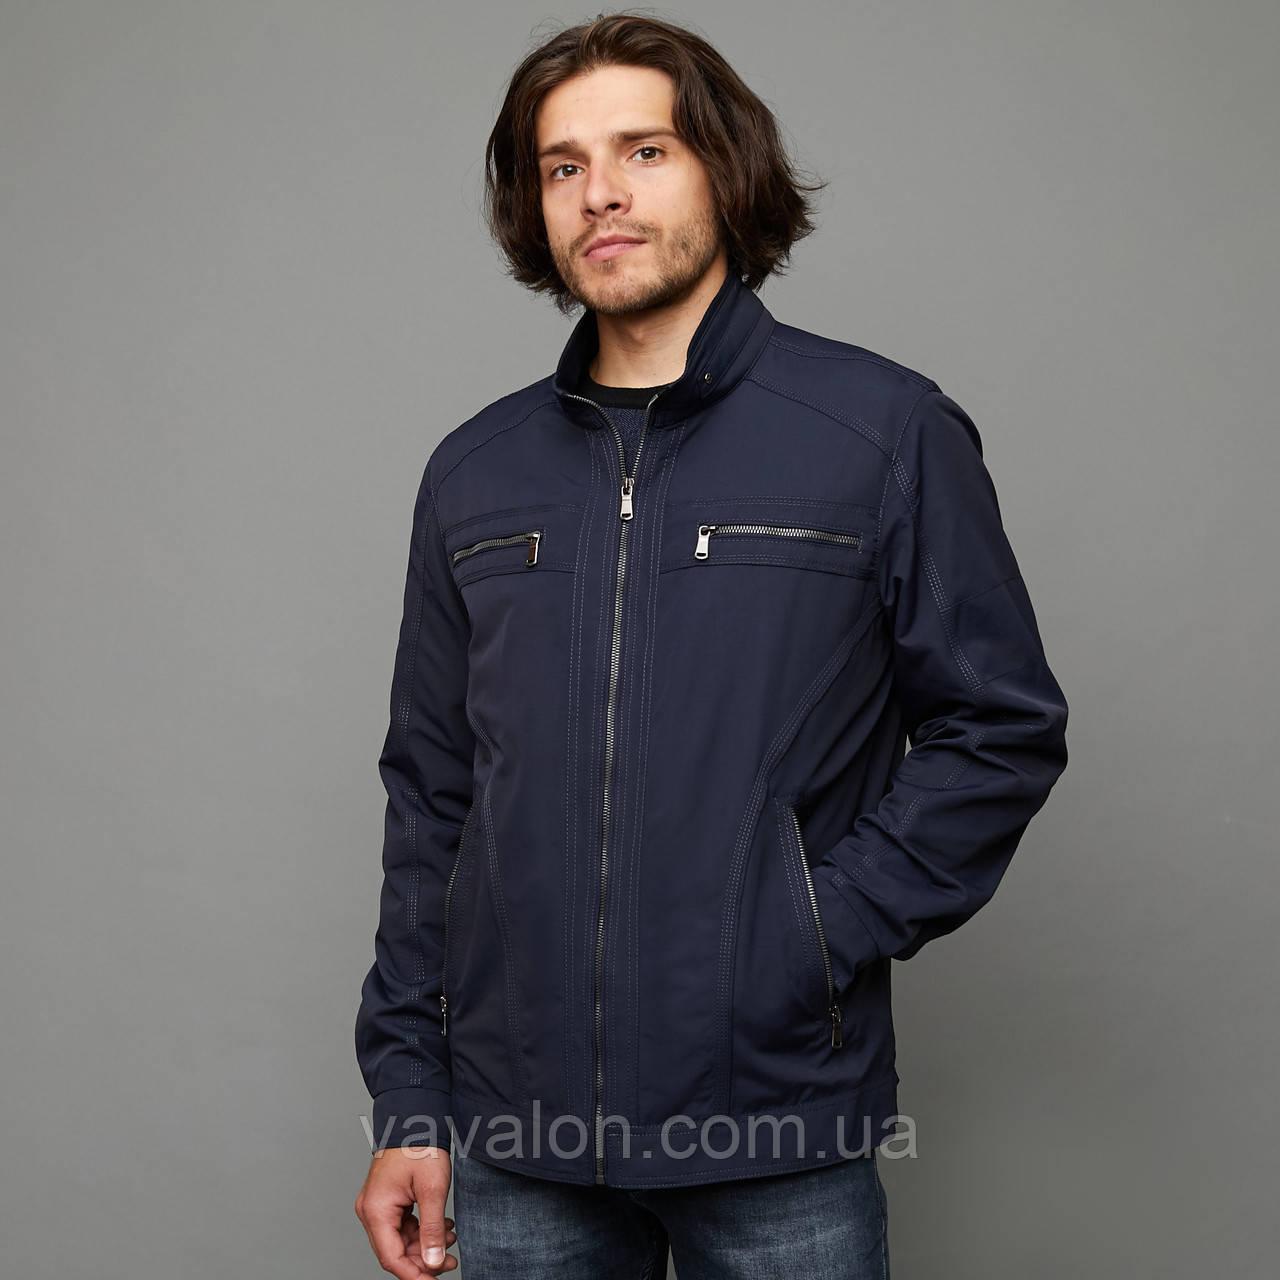 Куртка ветровка Vavalon 117 KV